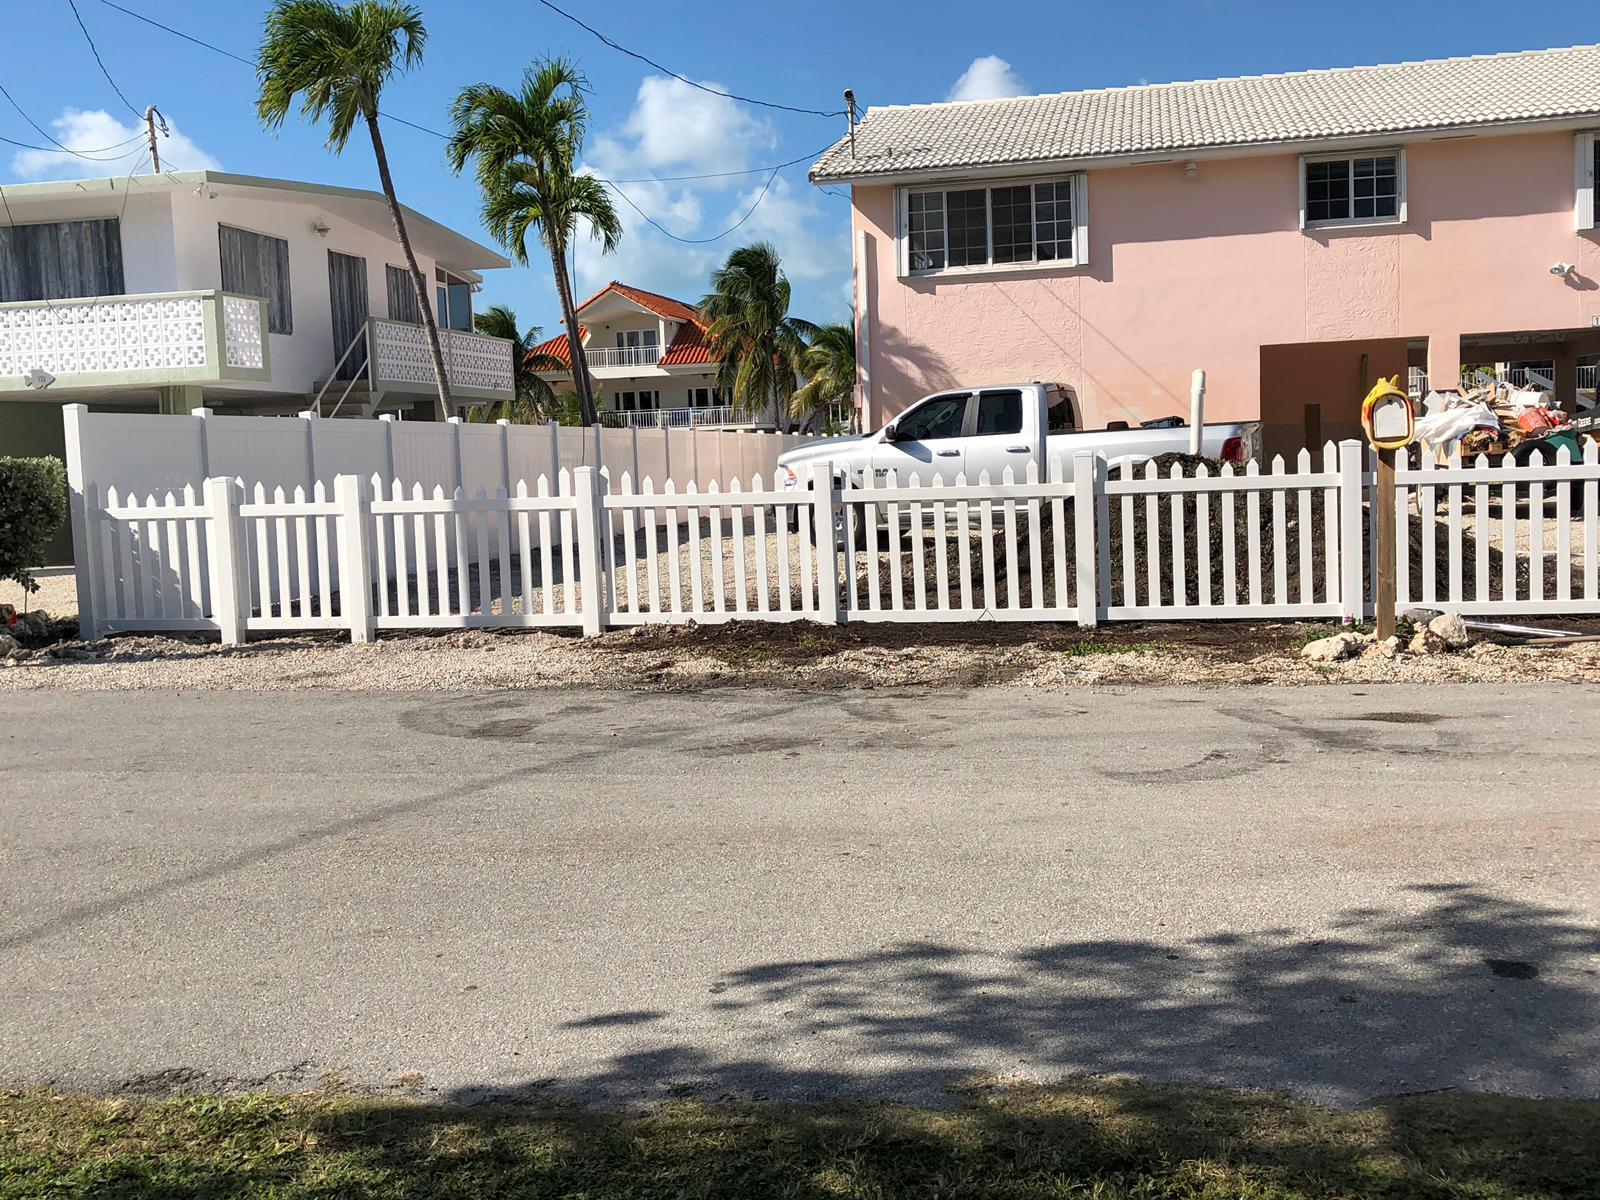 commercial fence installation job in Miramar Florida